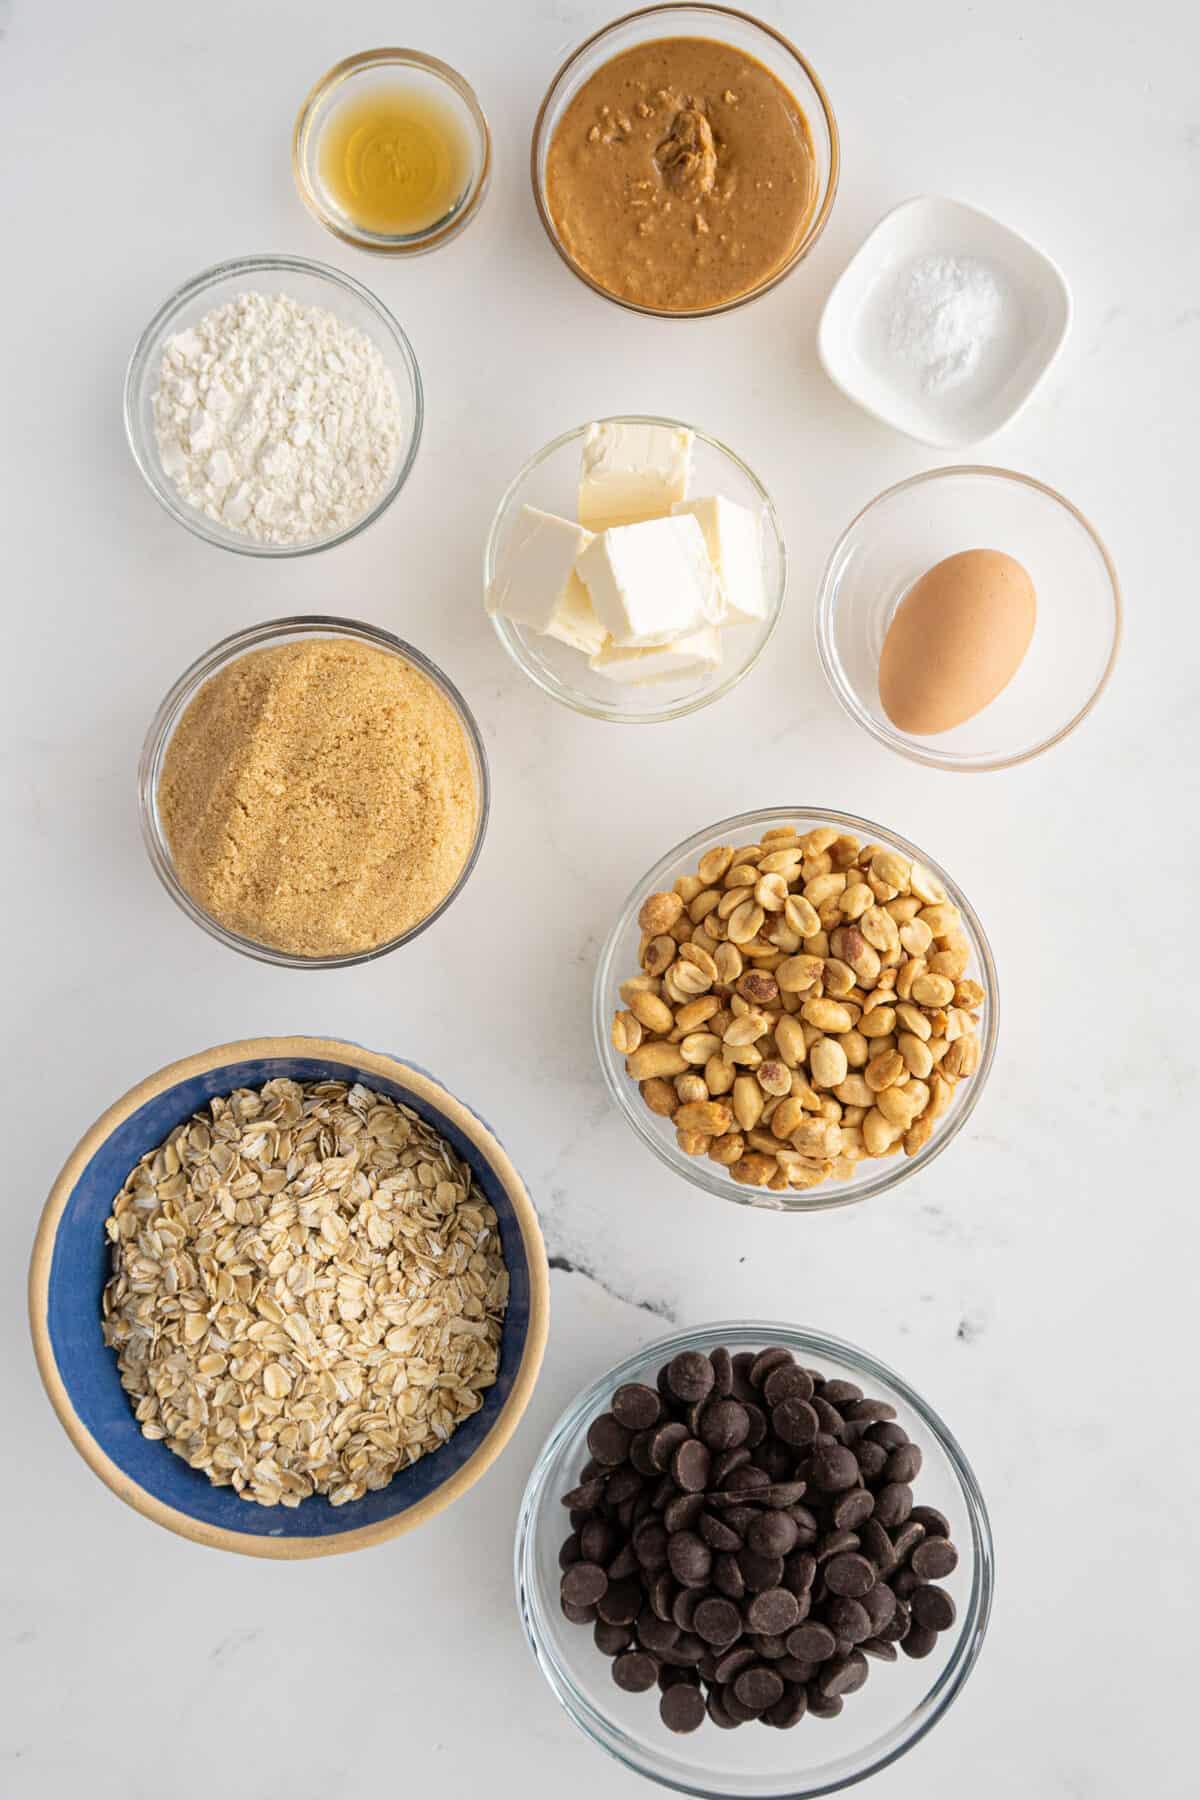 Peanut Butter Oatmeal Cookies ingredients